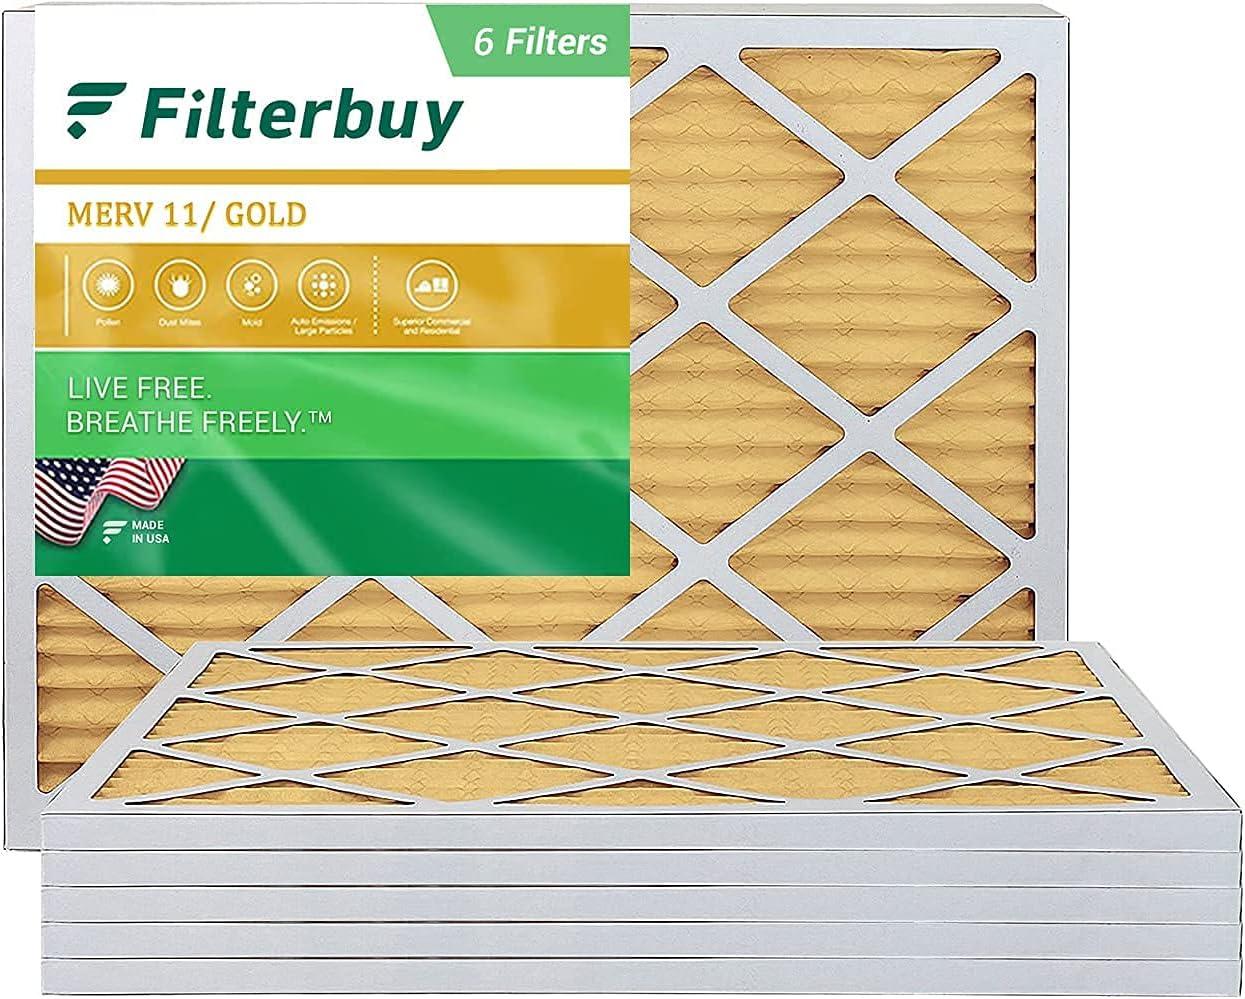 FilterBuy 18x24x1 Air Filter MERV 11 Pleated Surprise price Max 88% OFF Fi Furnace AC HVAC